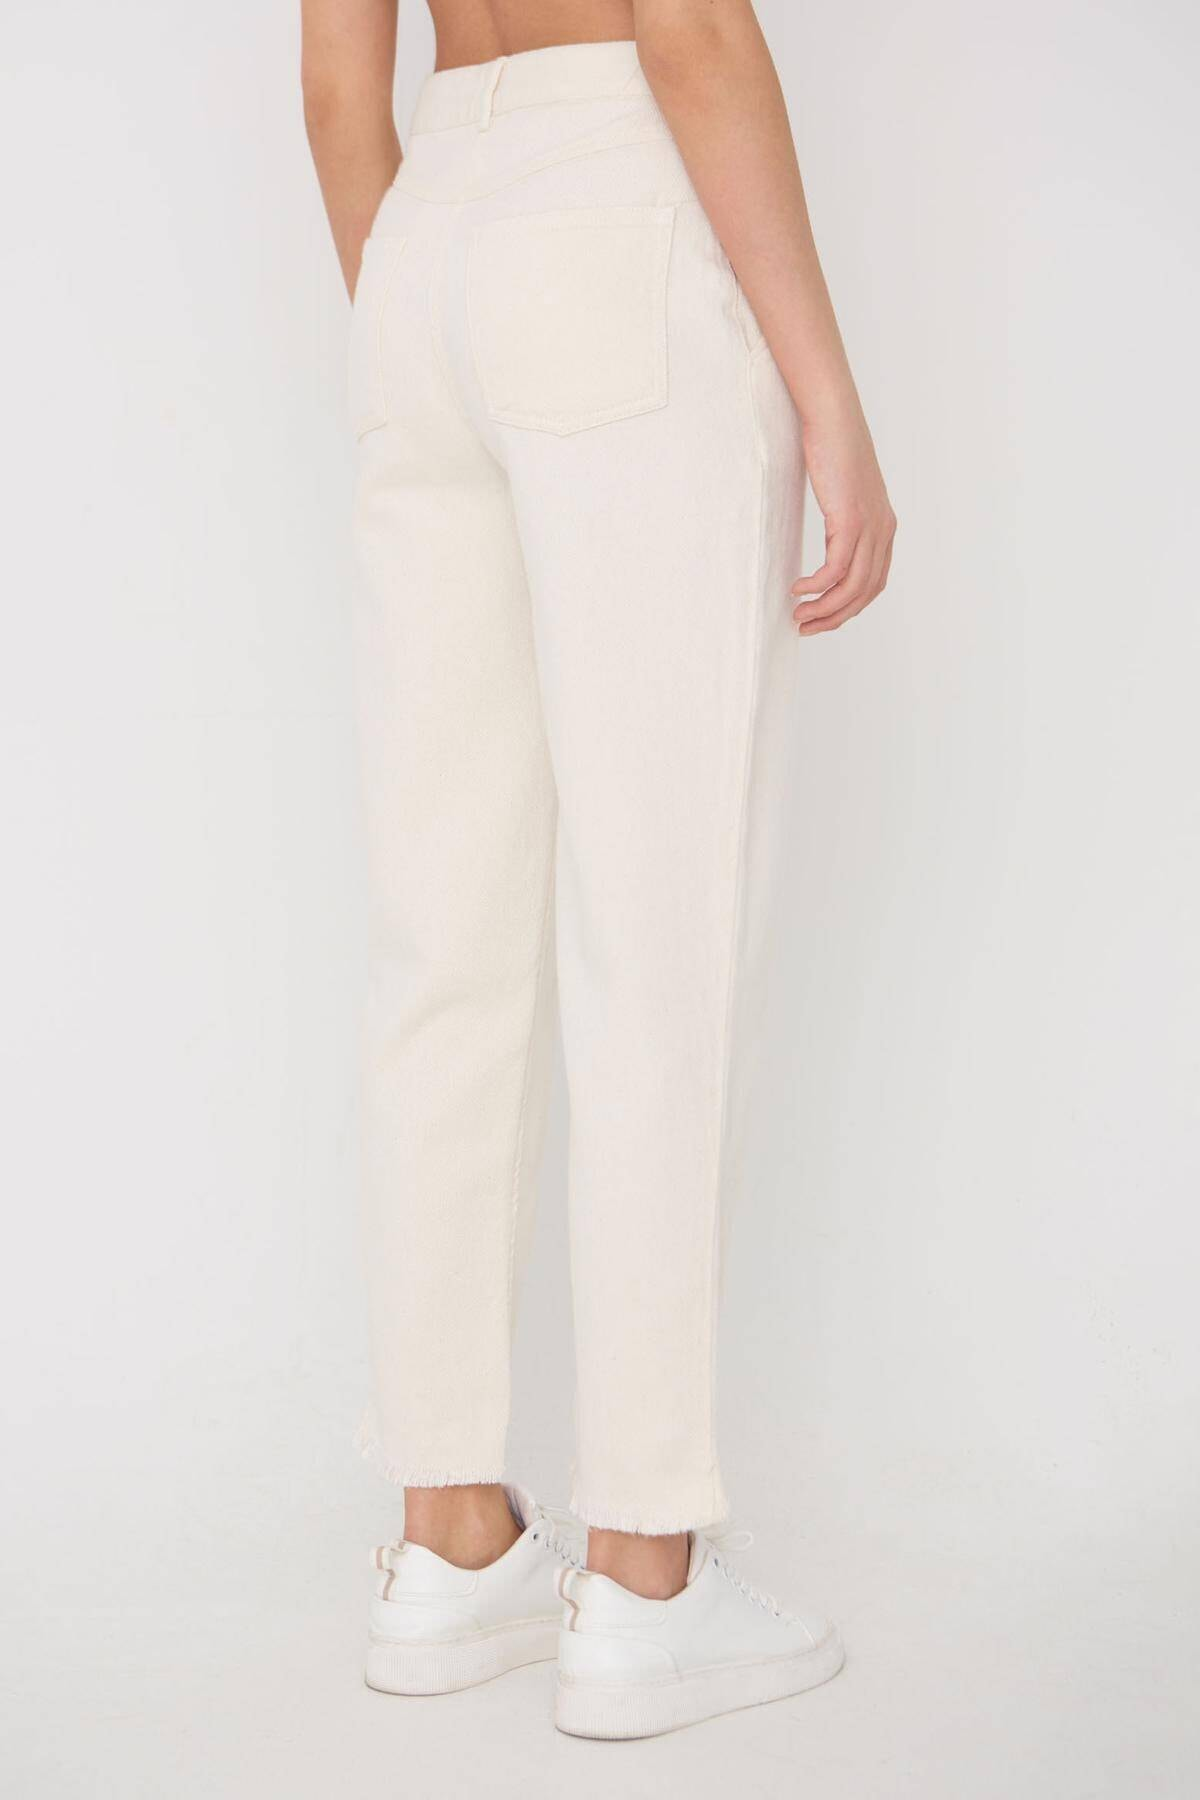 Addax Kadın Ham Paça Detaylı Pantolon Pn11-0049 - K8 Adx-0000023876 4